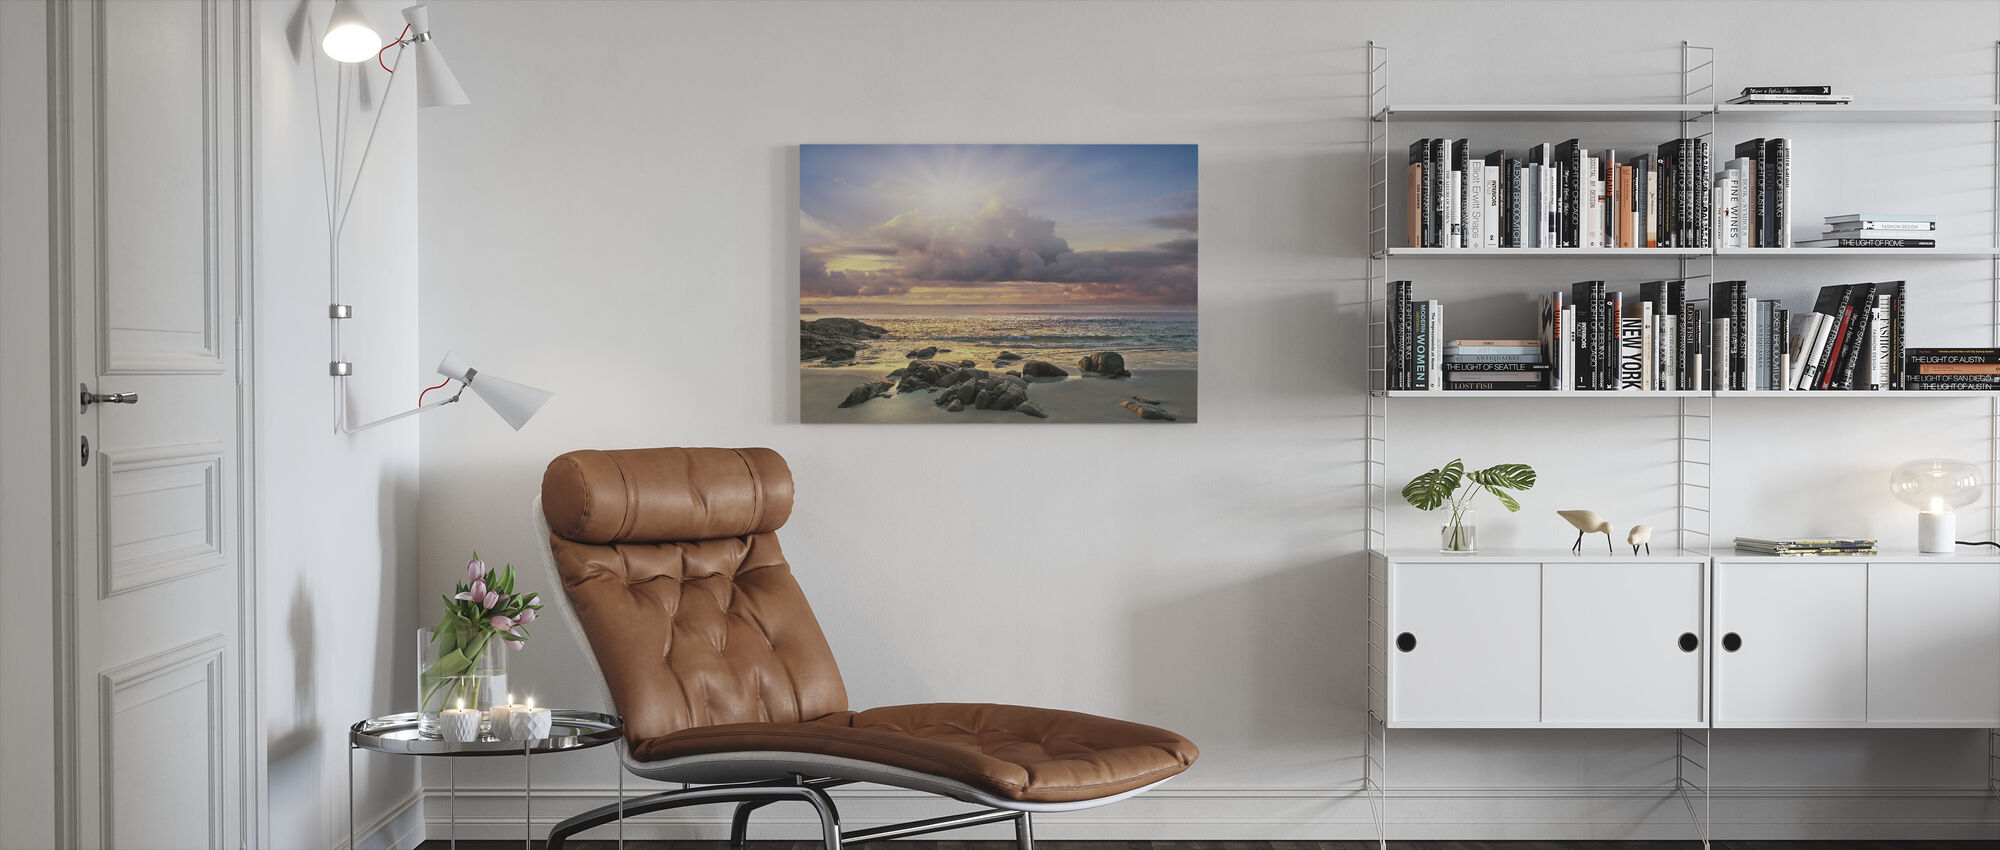 Soluppgång bakom moln - Canvastavla - Vardagsrum